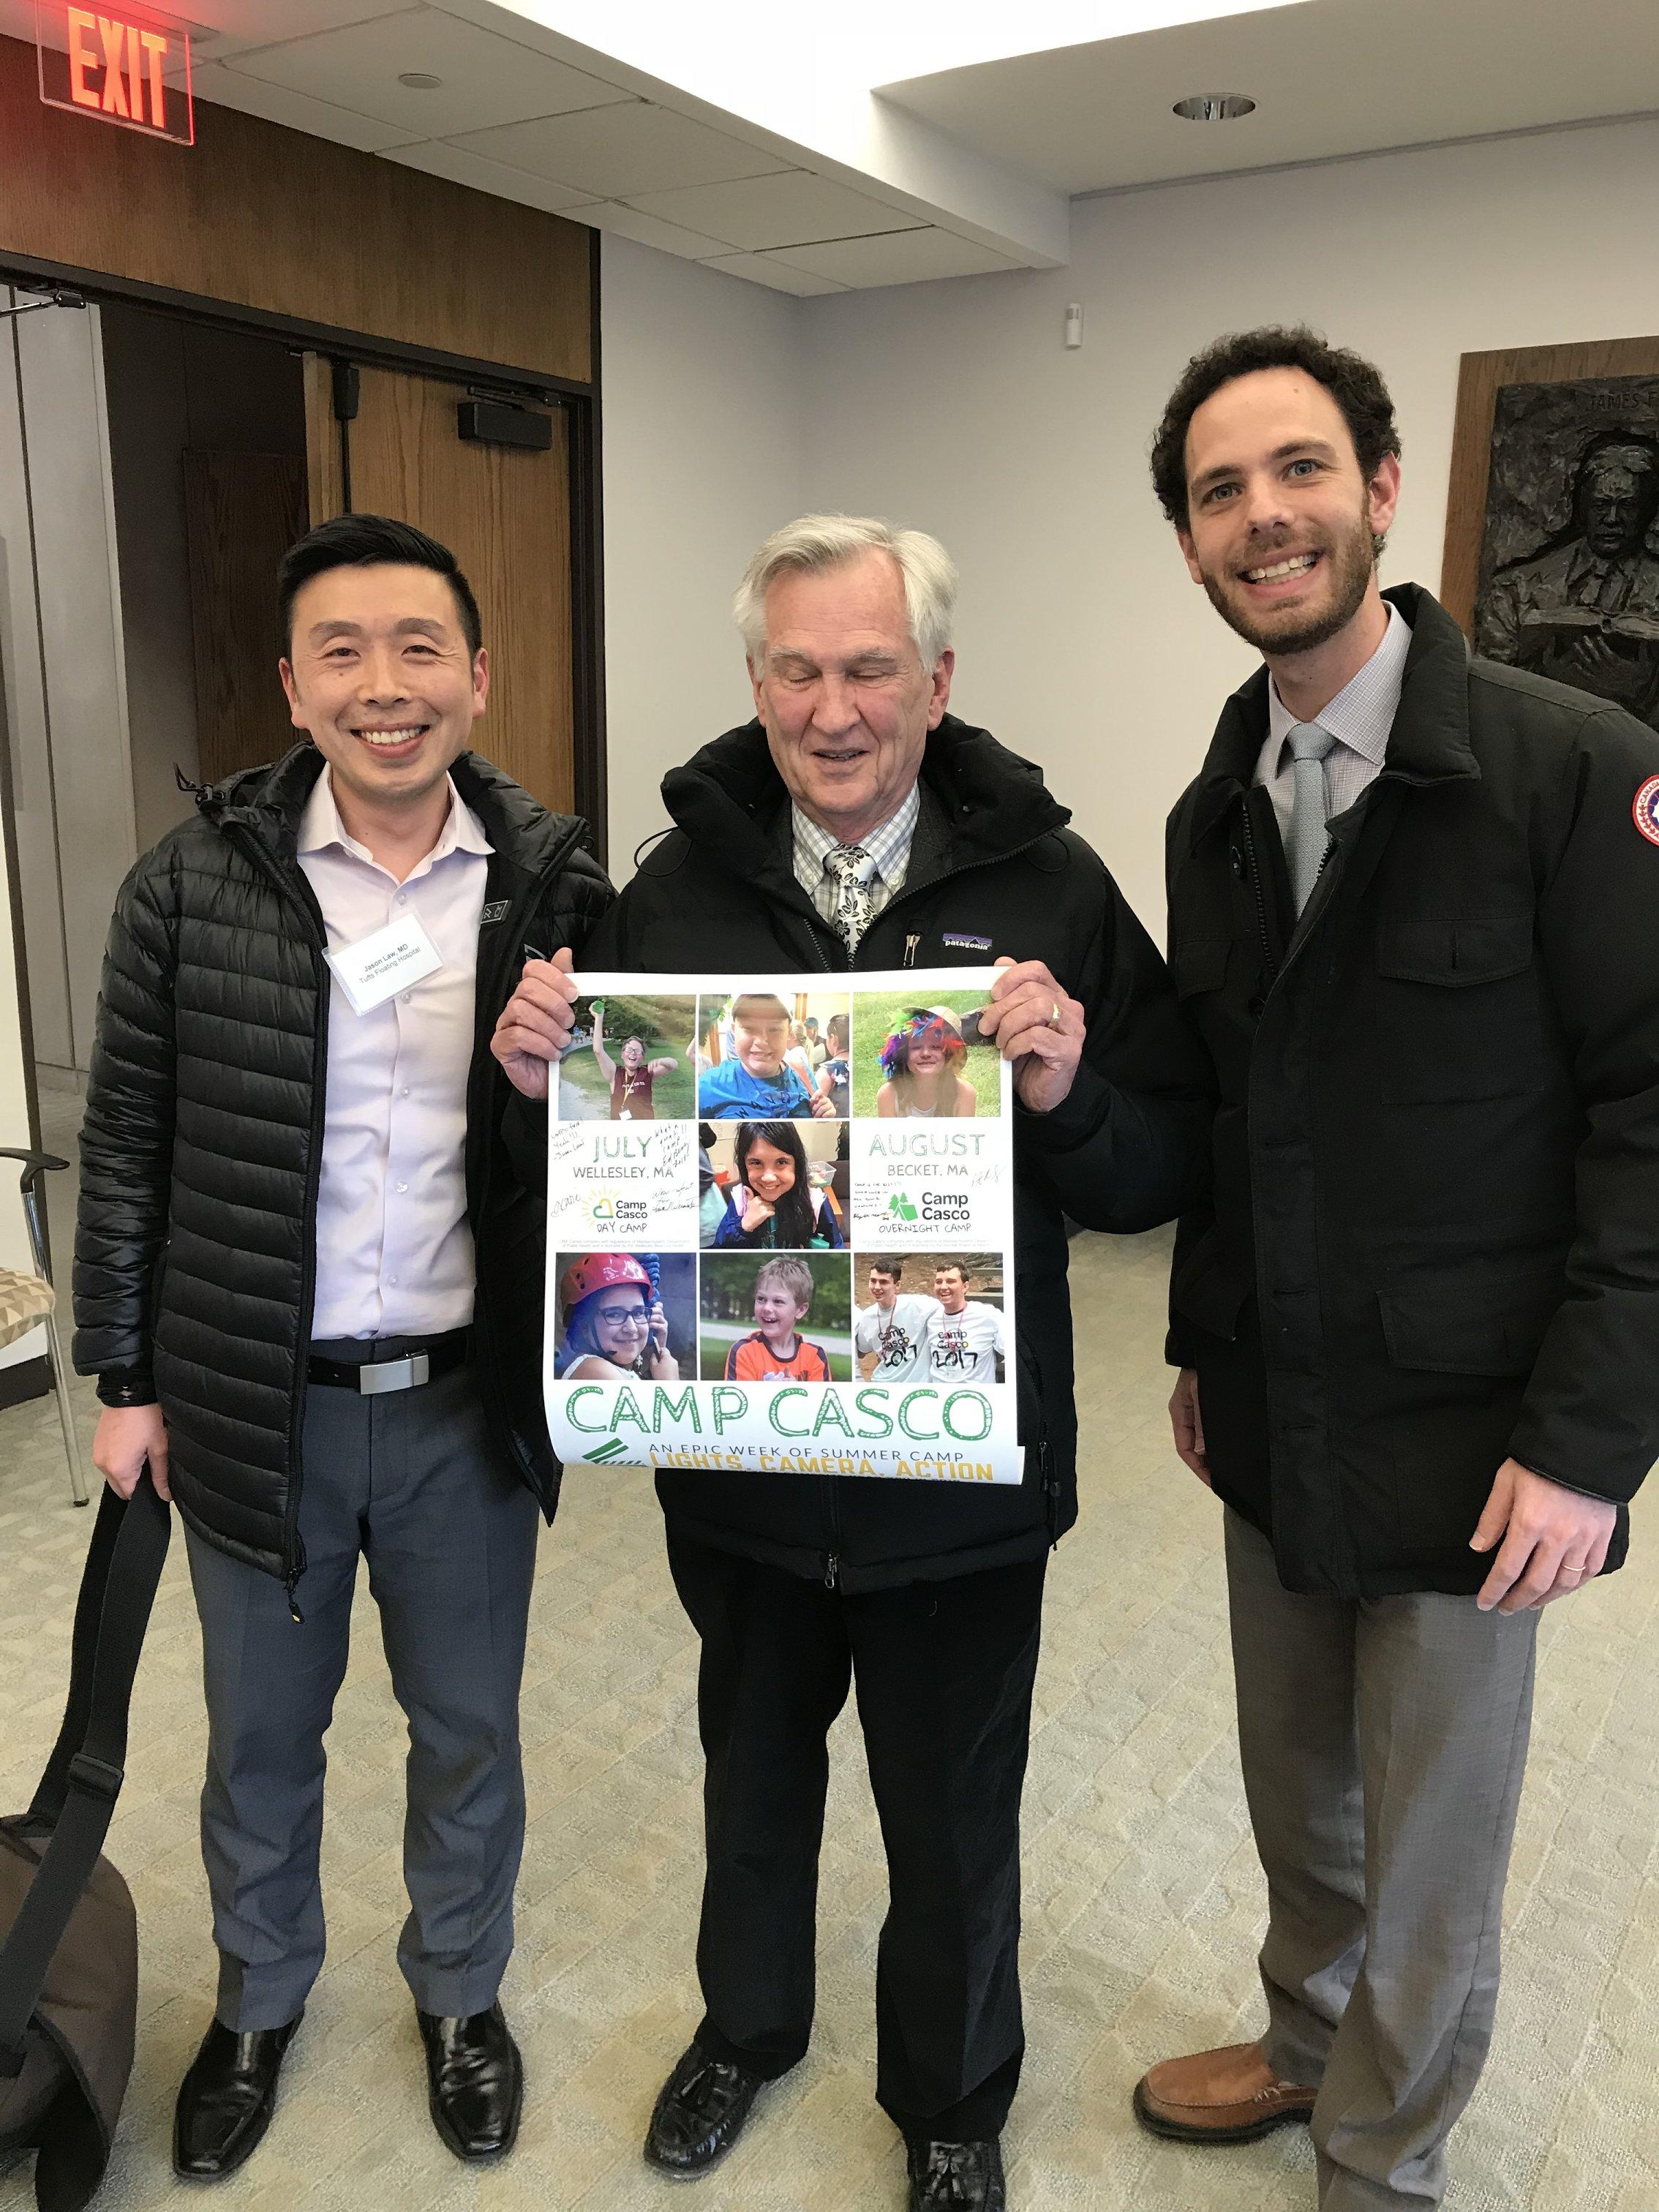 L to R: Dr. Jason Law, Dr. Edward Benz, and Dr. Michael Goldberg